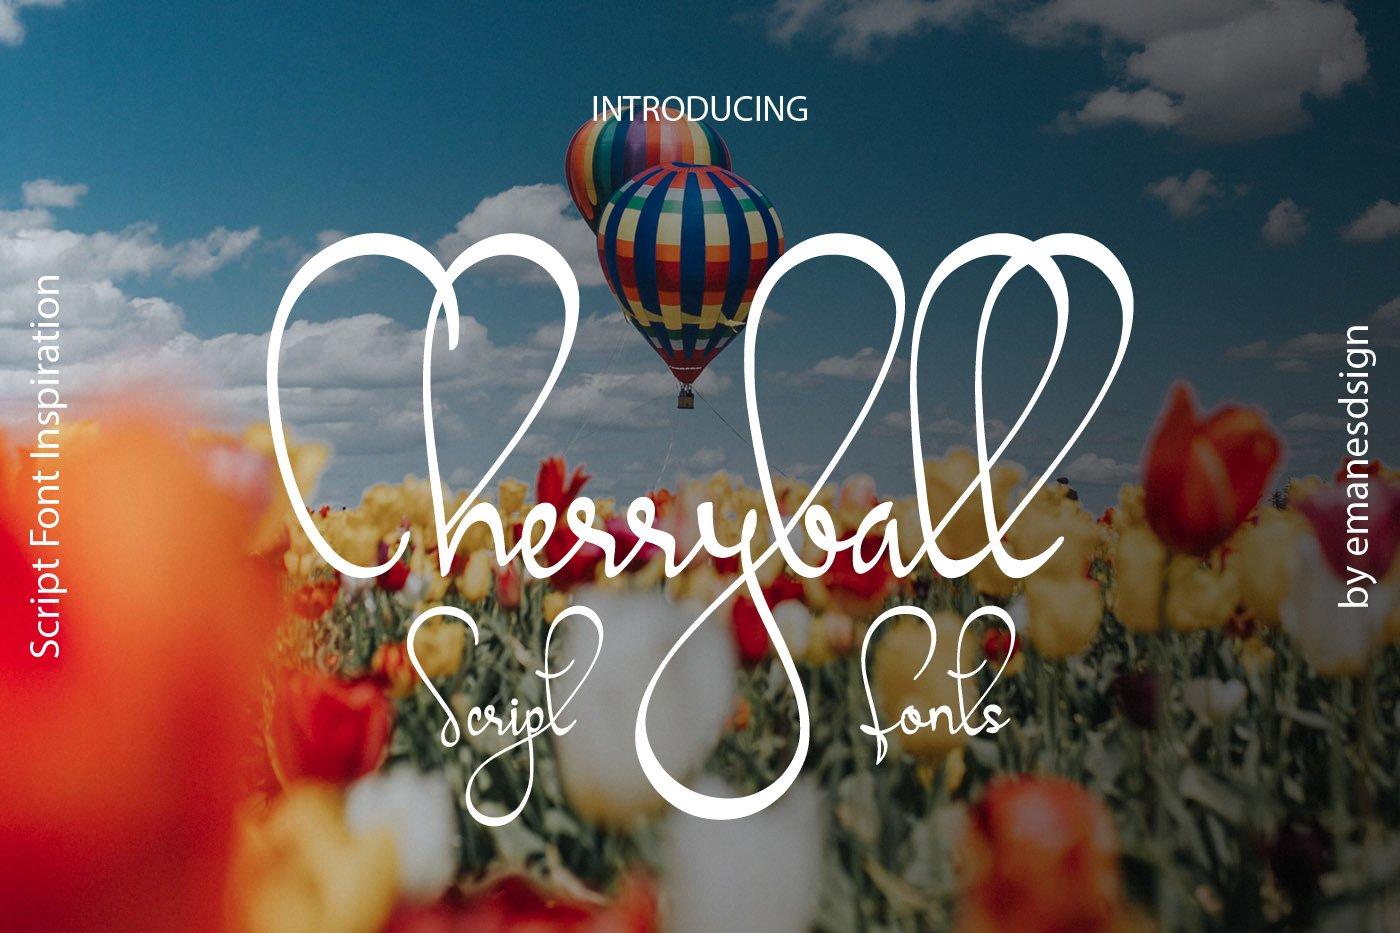 Cherryball example image 1